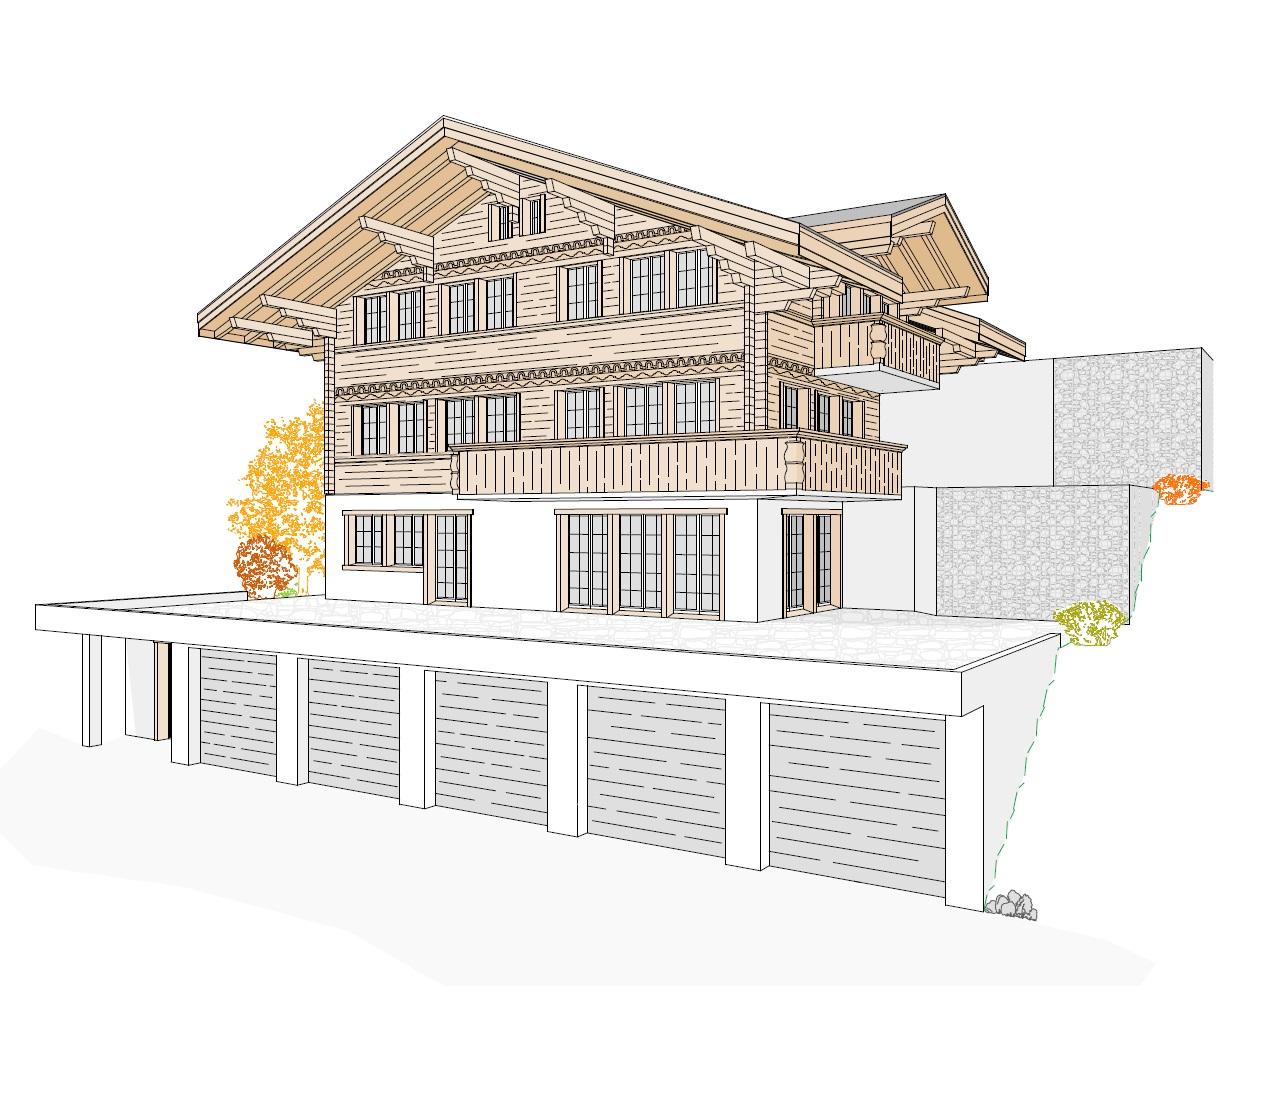 Neubauten gr nenwald architektur lenk for Boden neubau